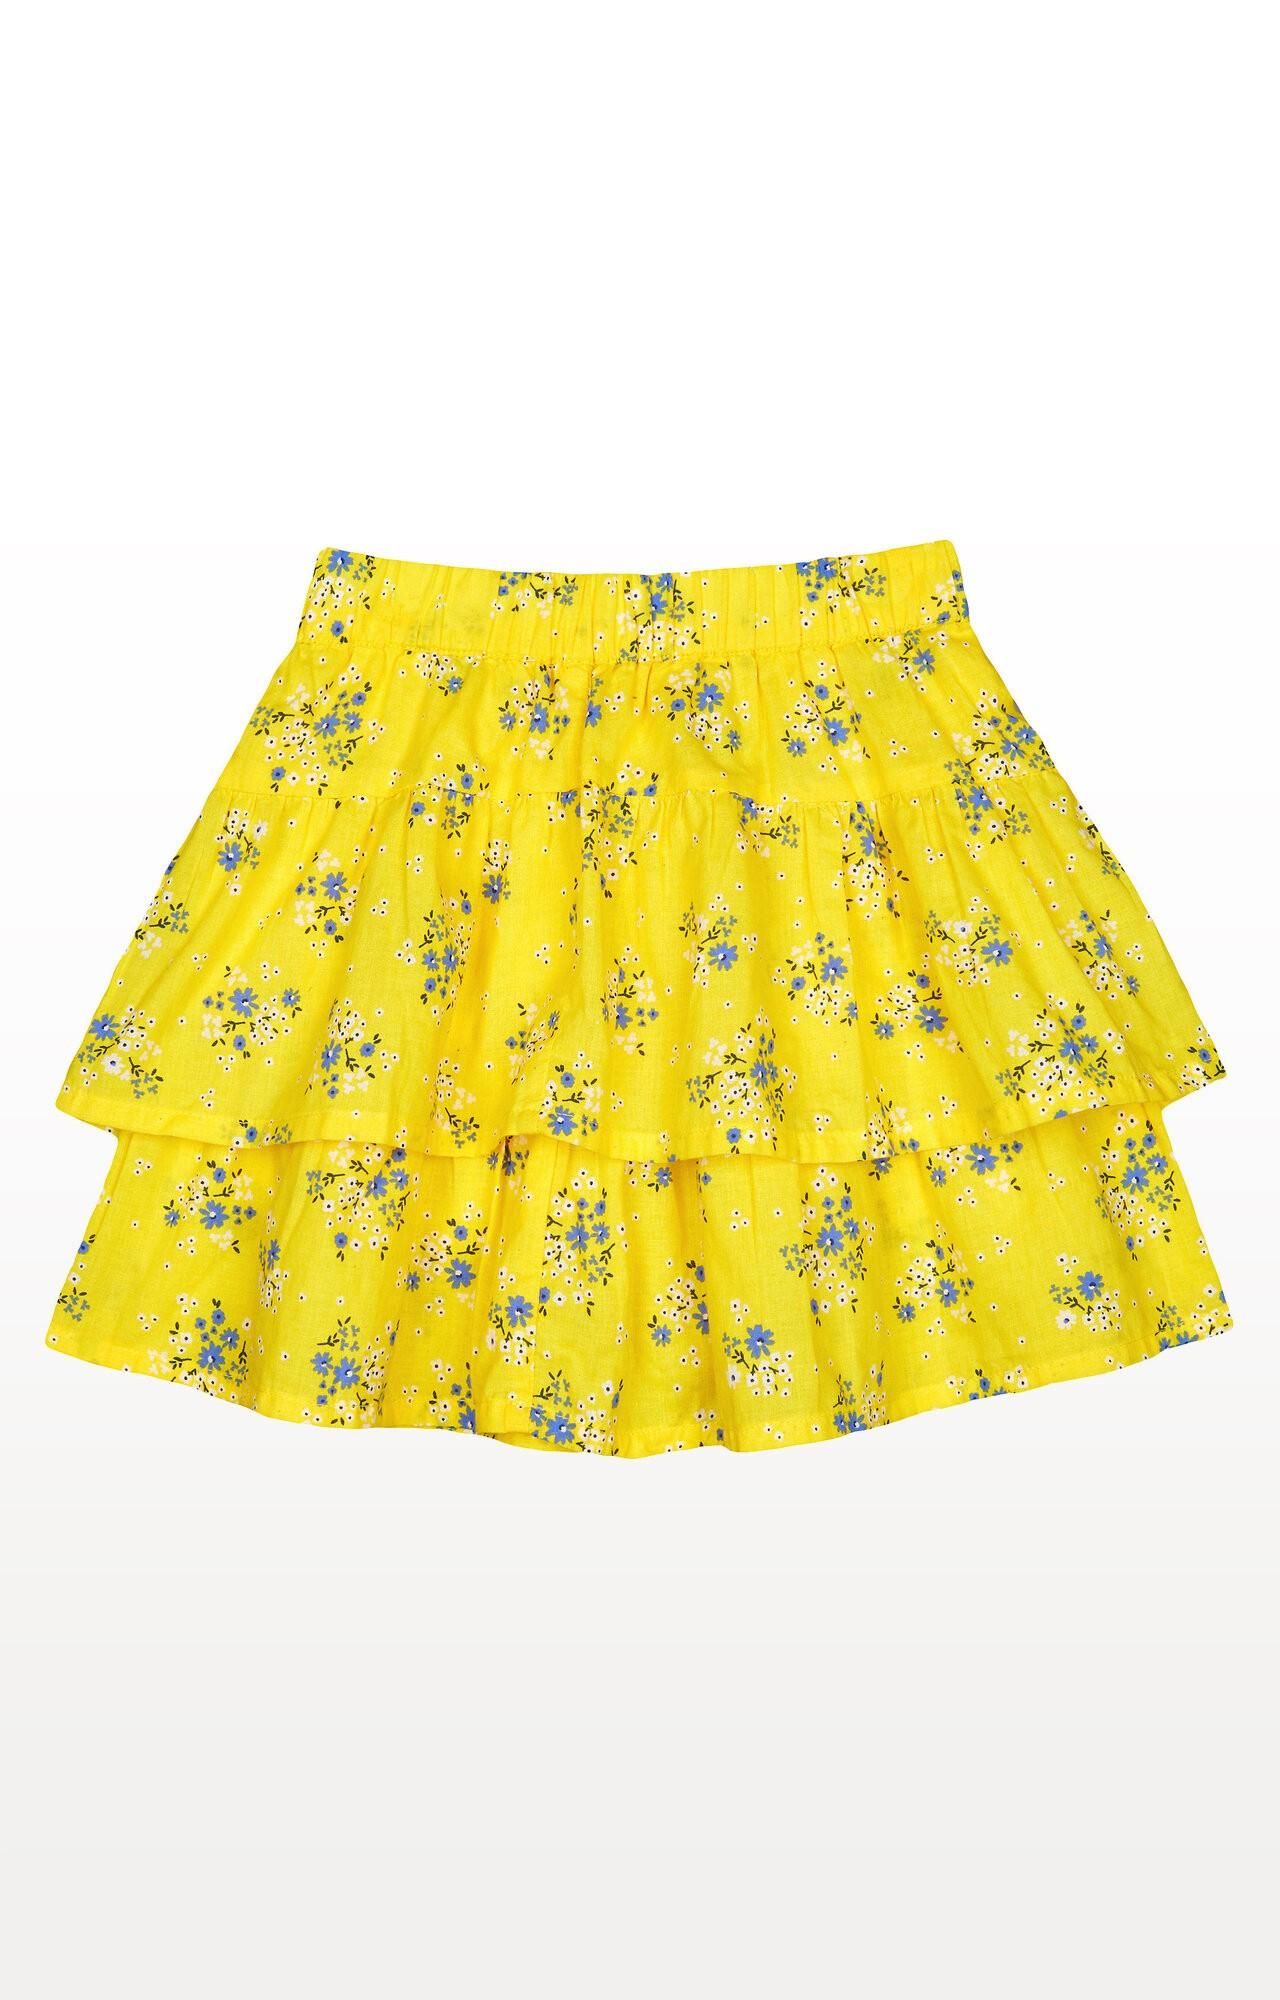 Mothercare | Yellow Ditsy Floral Ra Ra Skirt